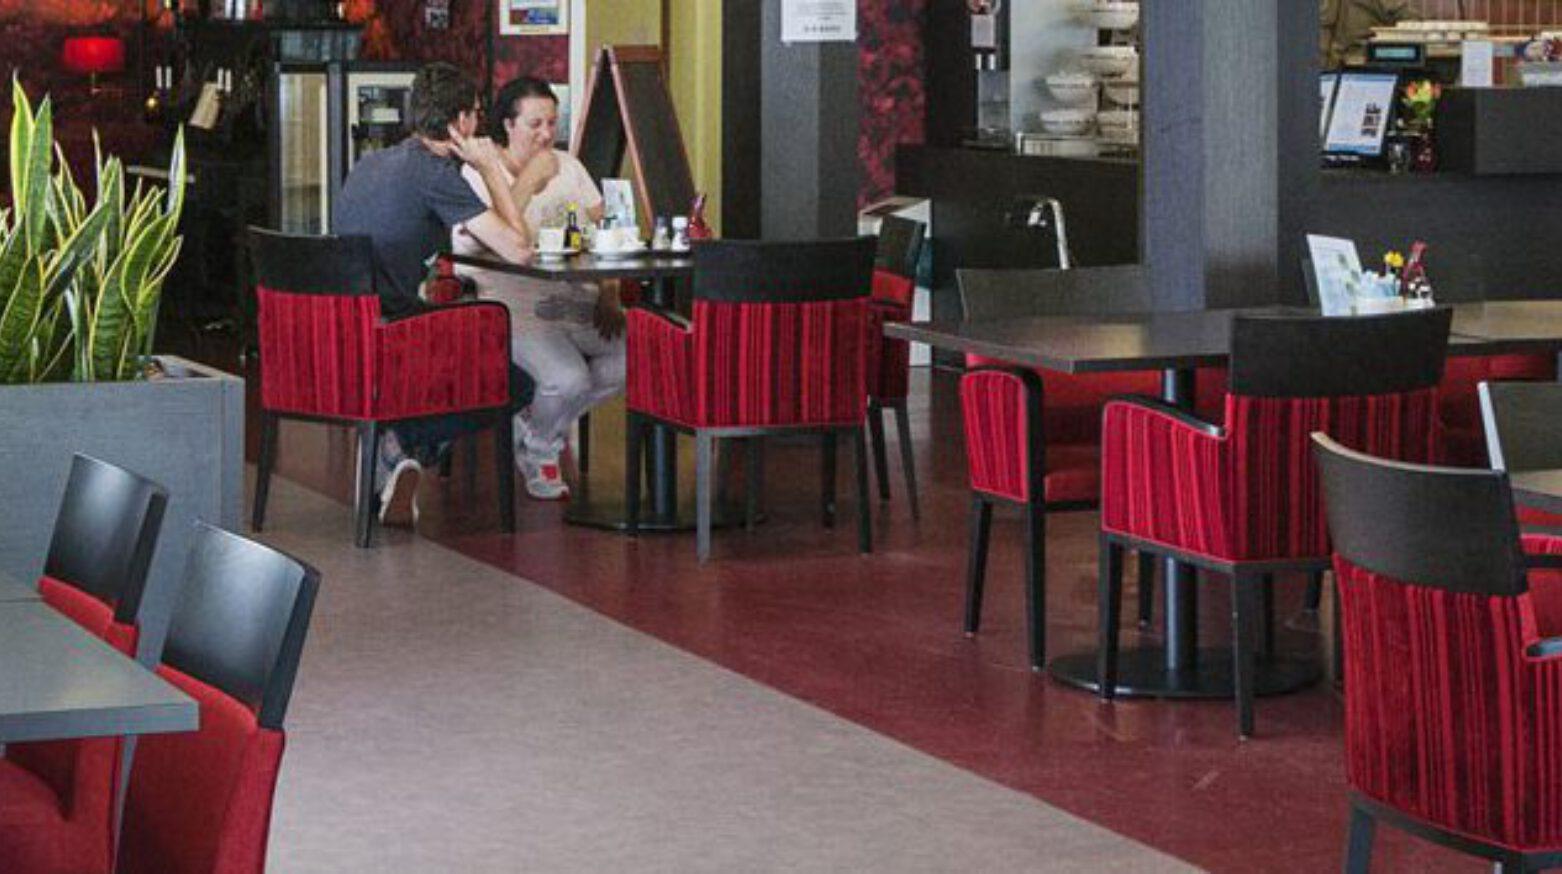 Tantelouise vivensis restaurant